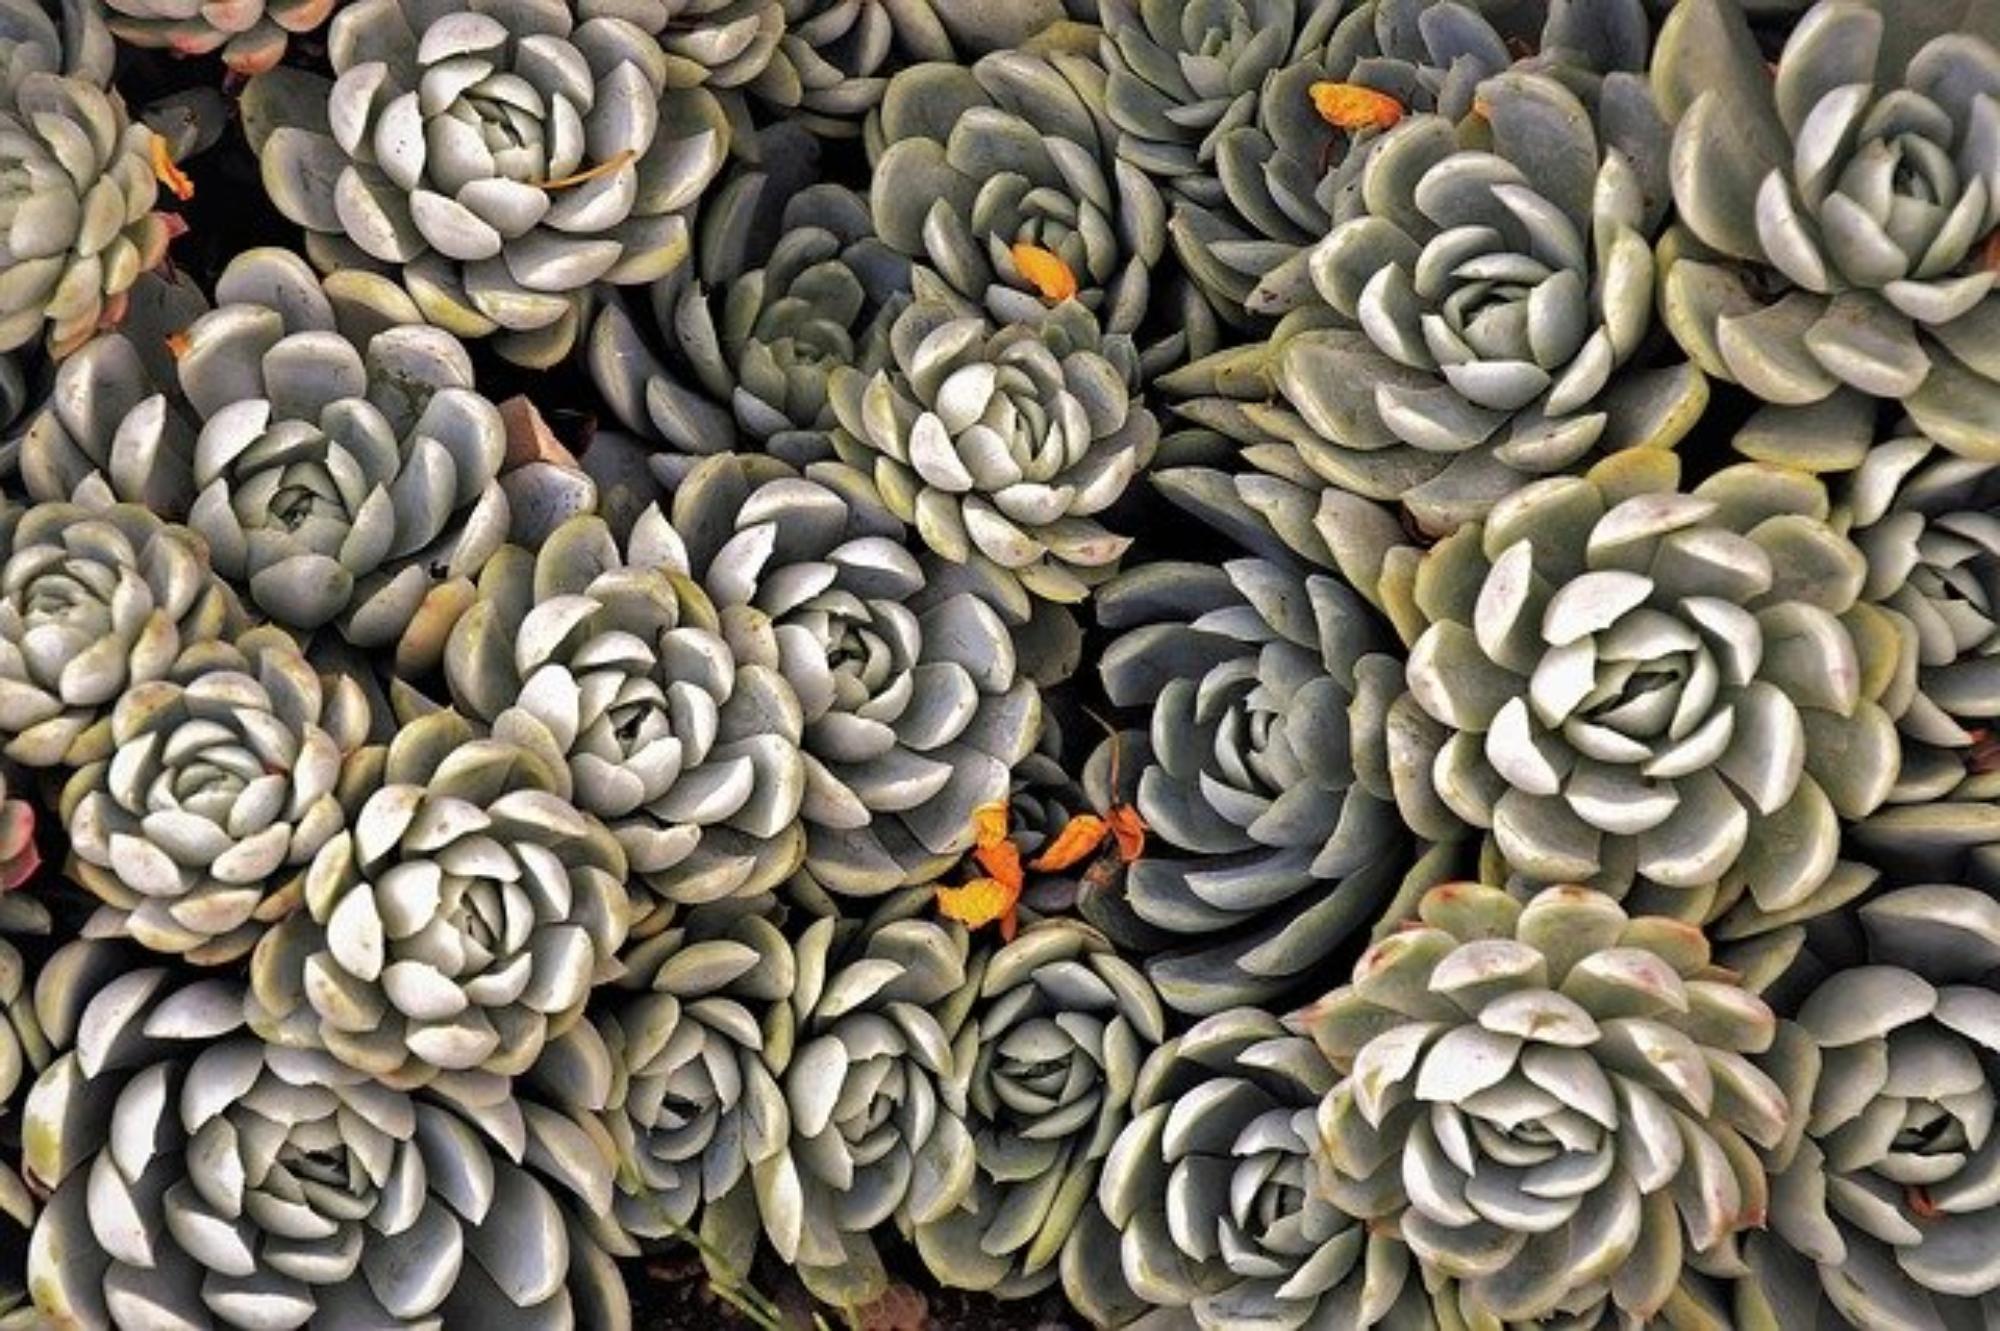 Sukulenty jako rośliny ogrodowe